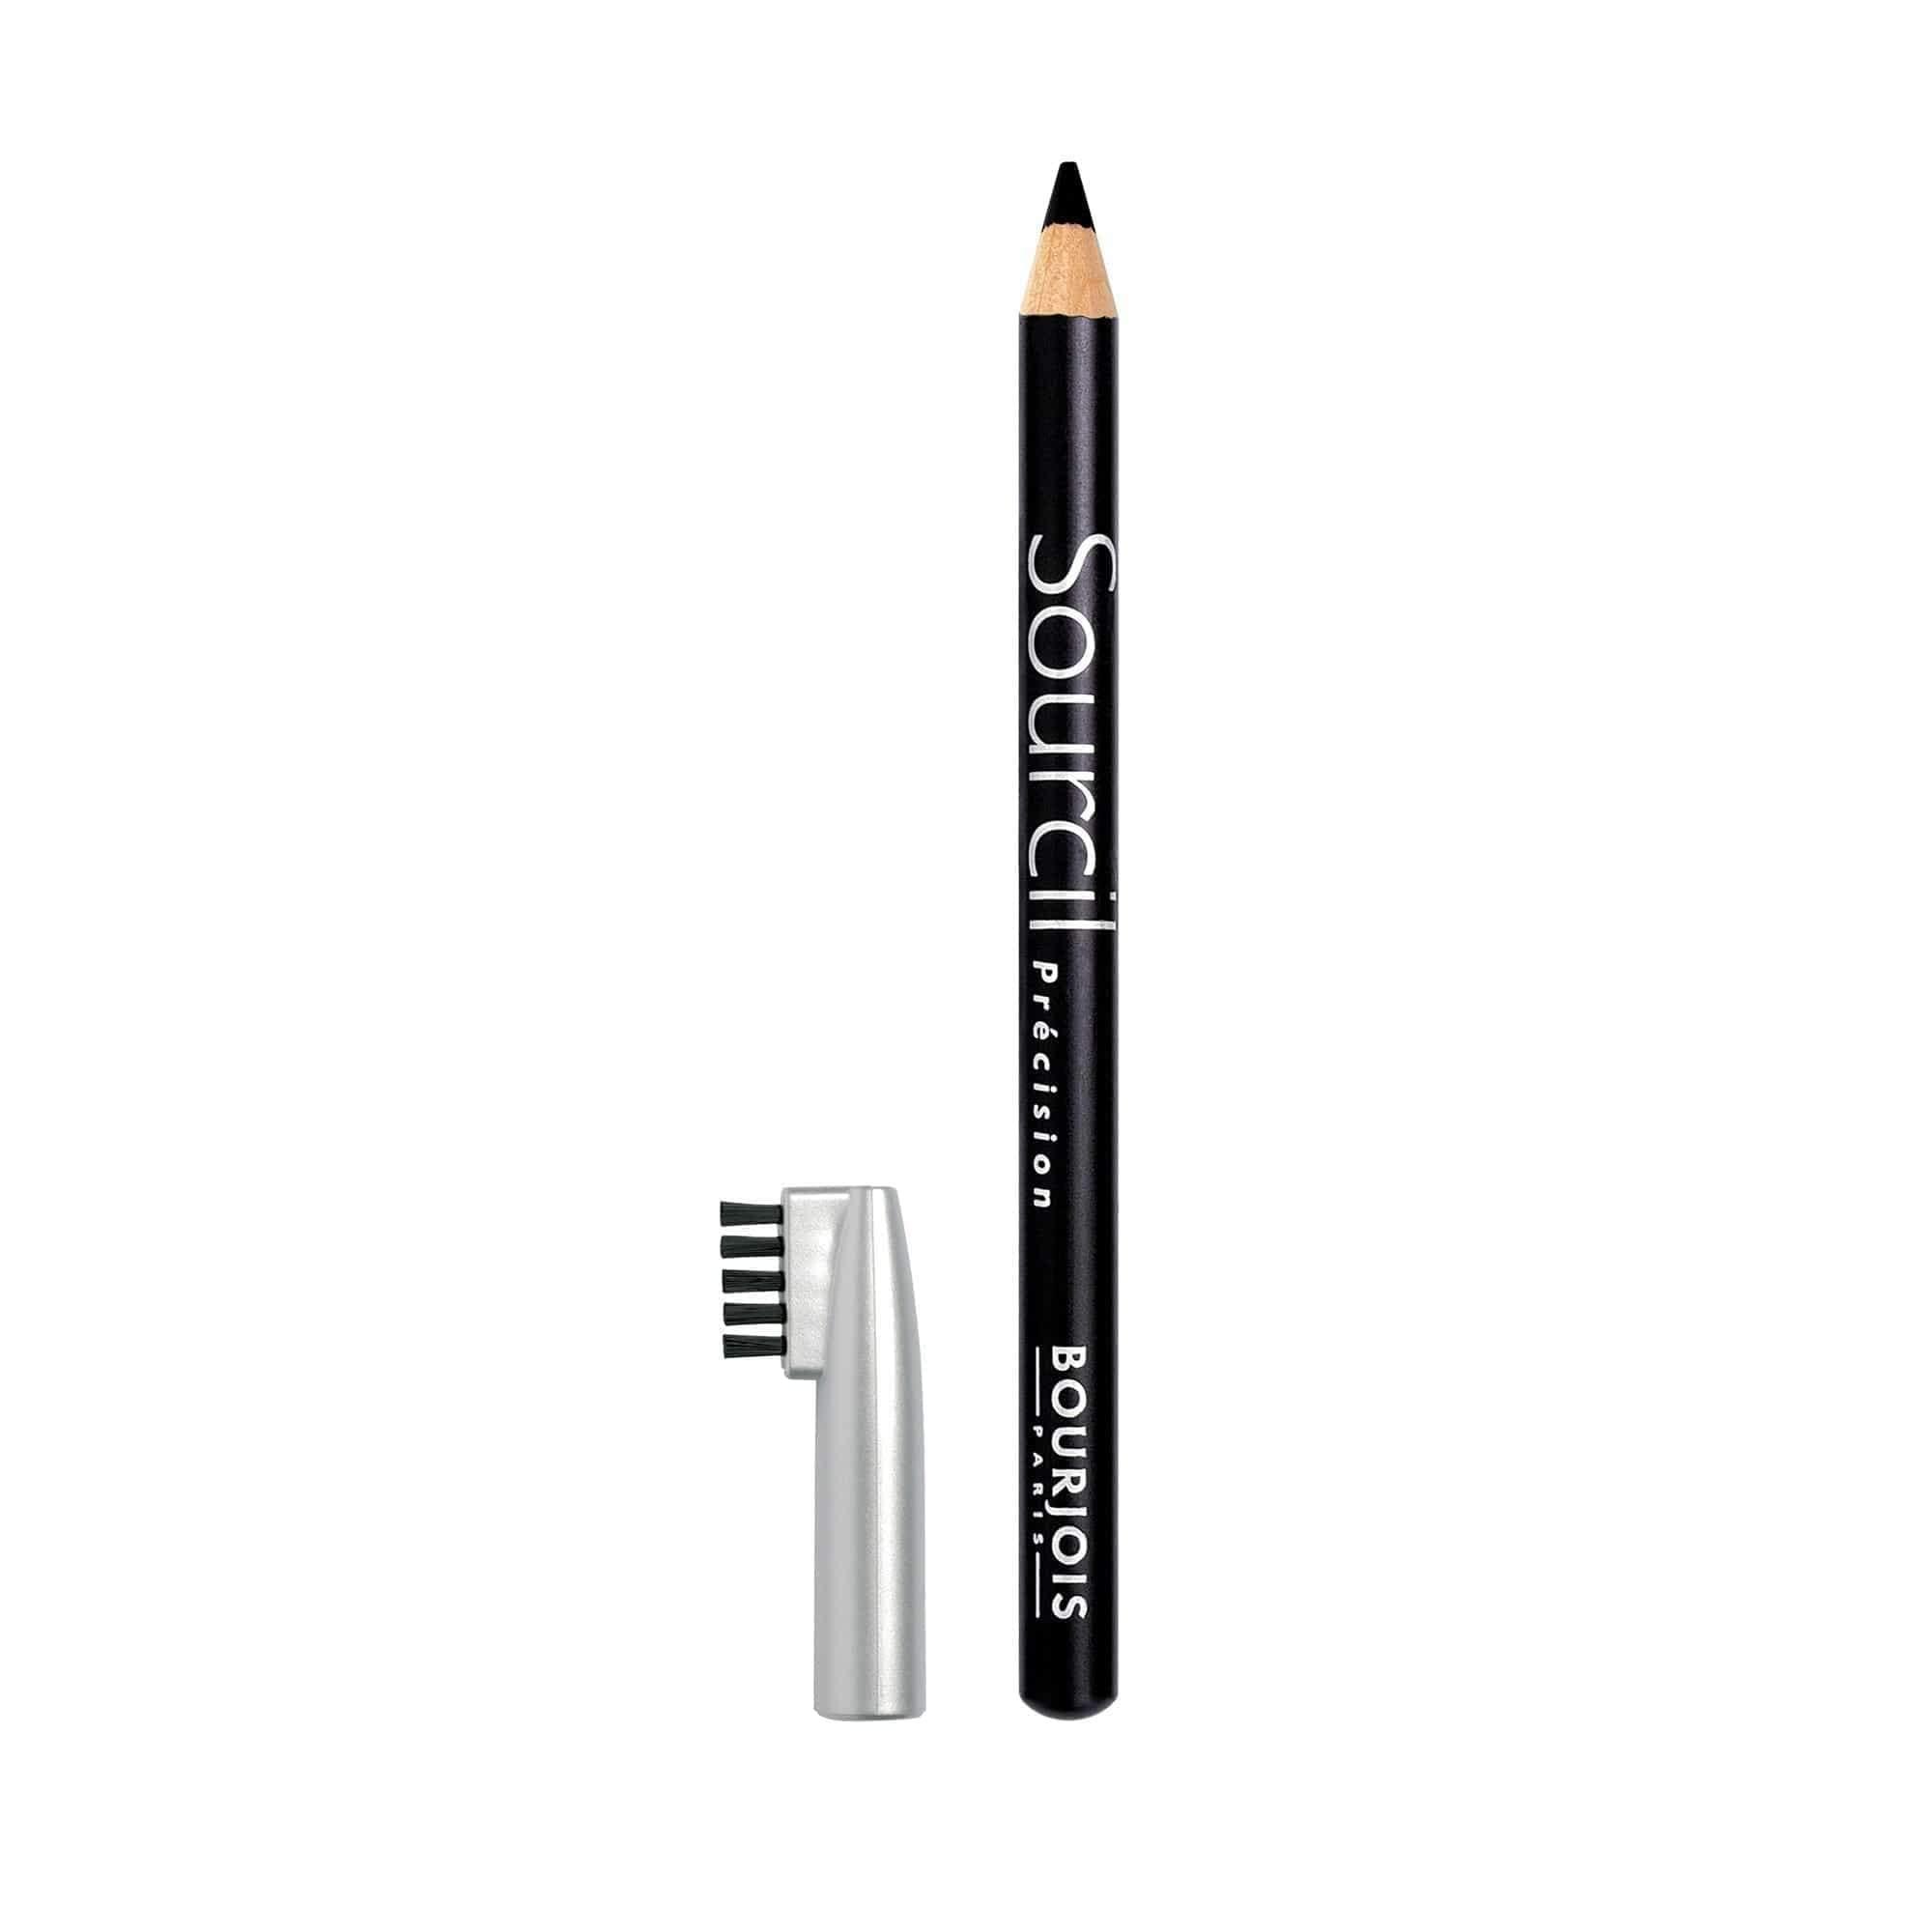 Bourjois_Crayon_Sourcil_Precision_Noir_Ebene